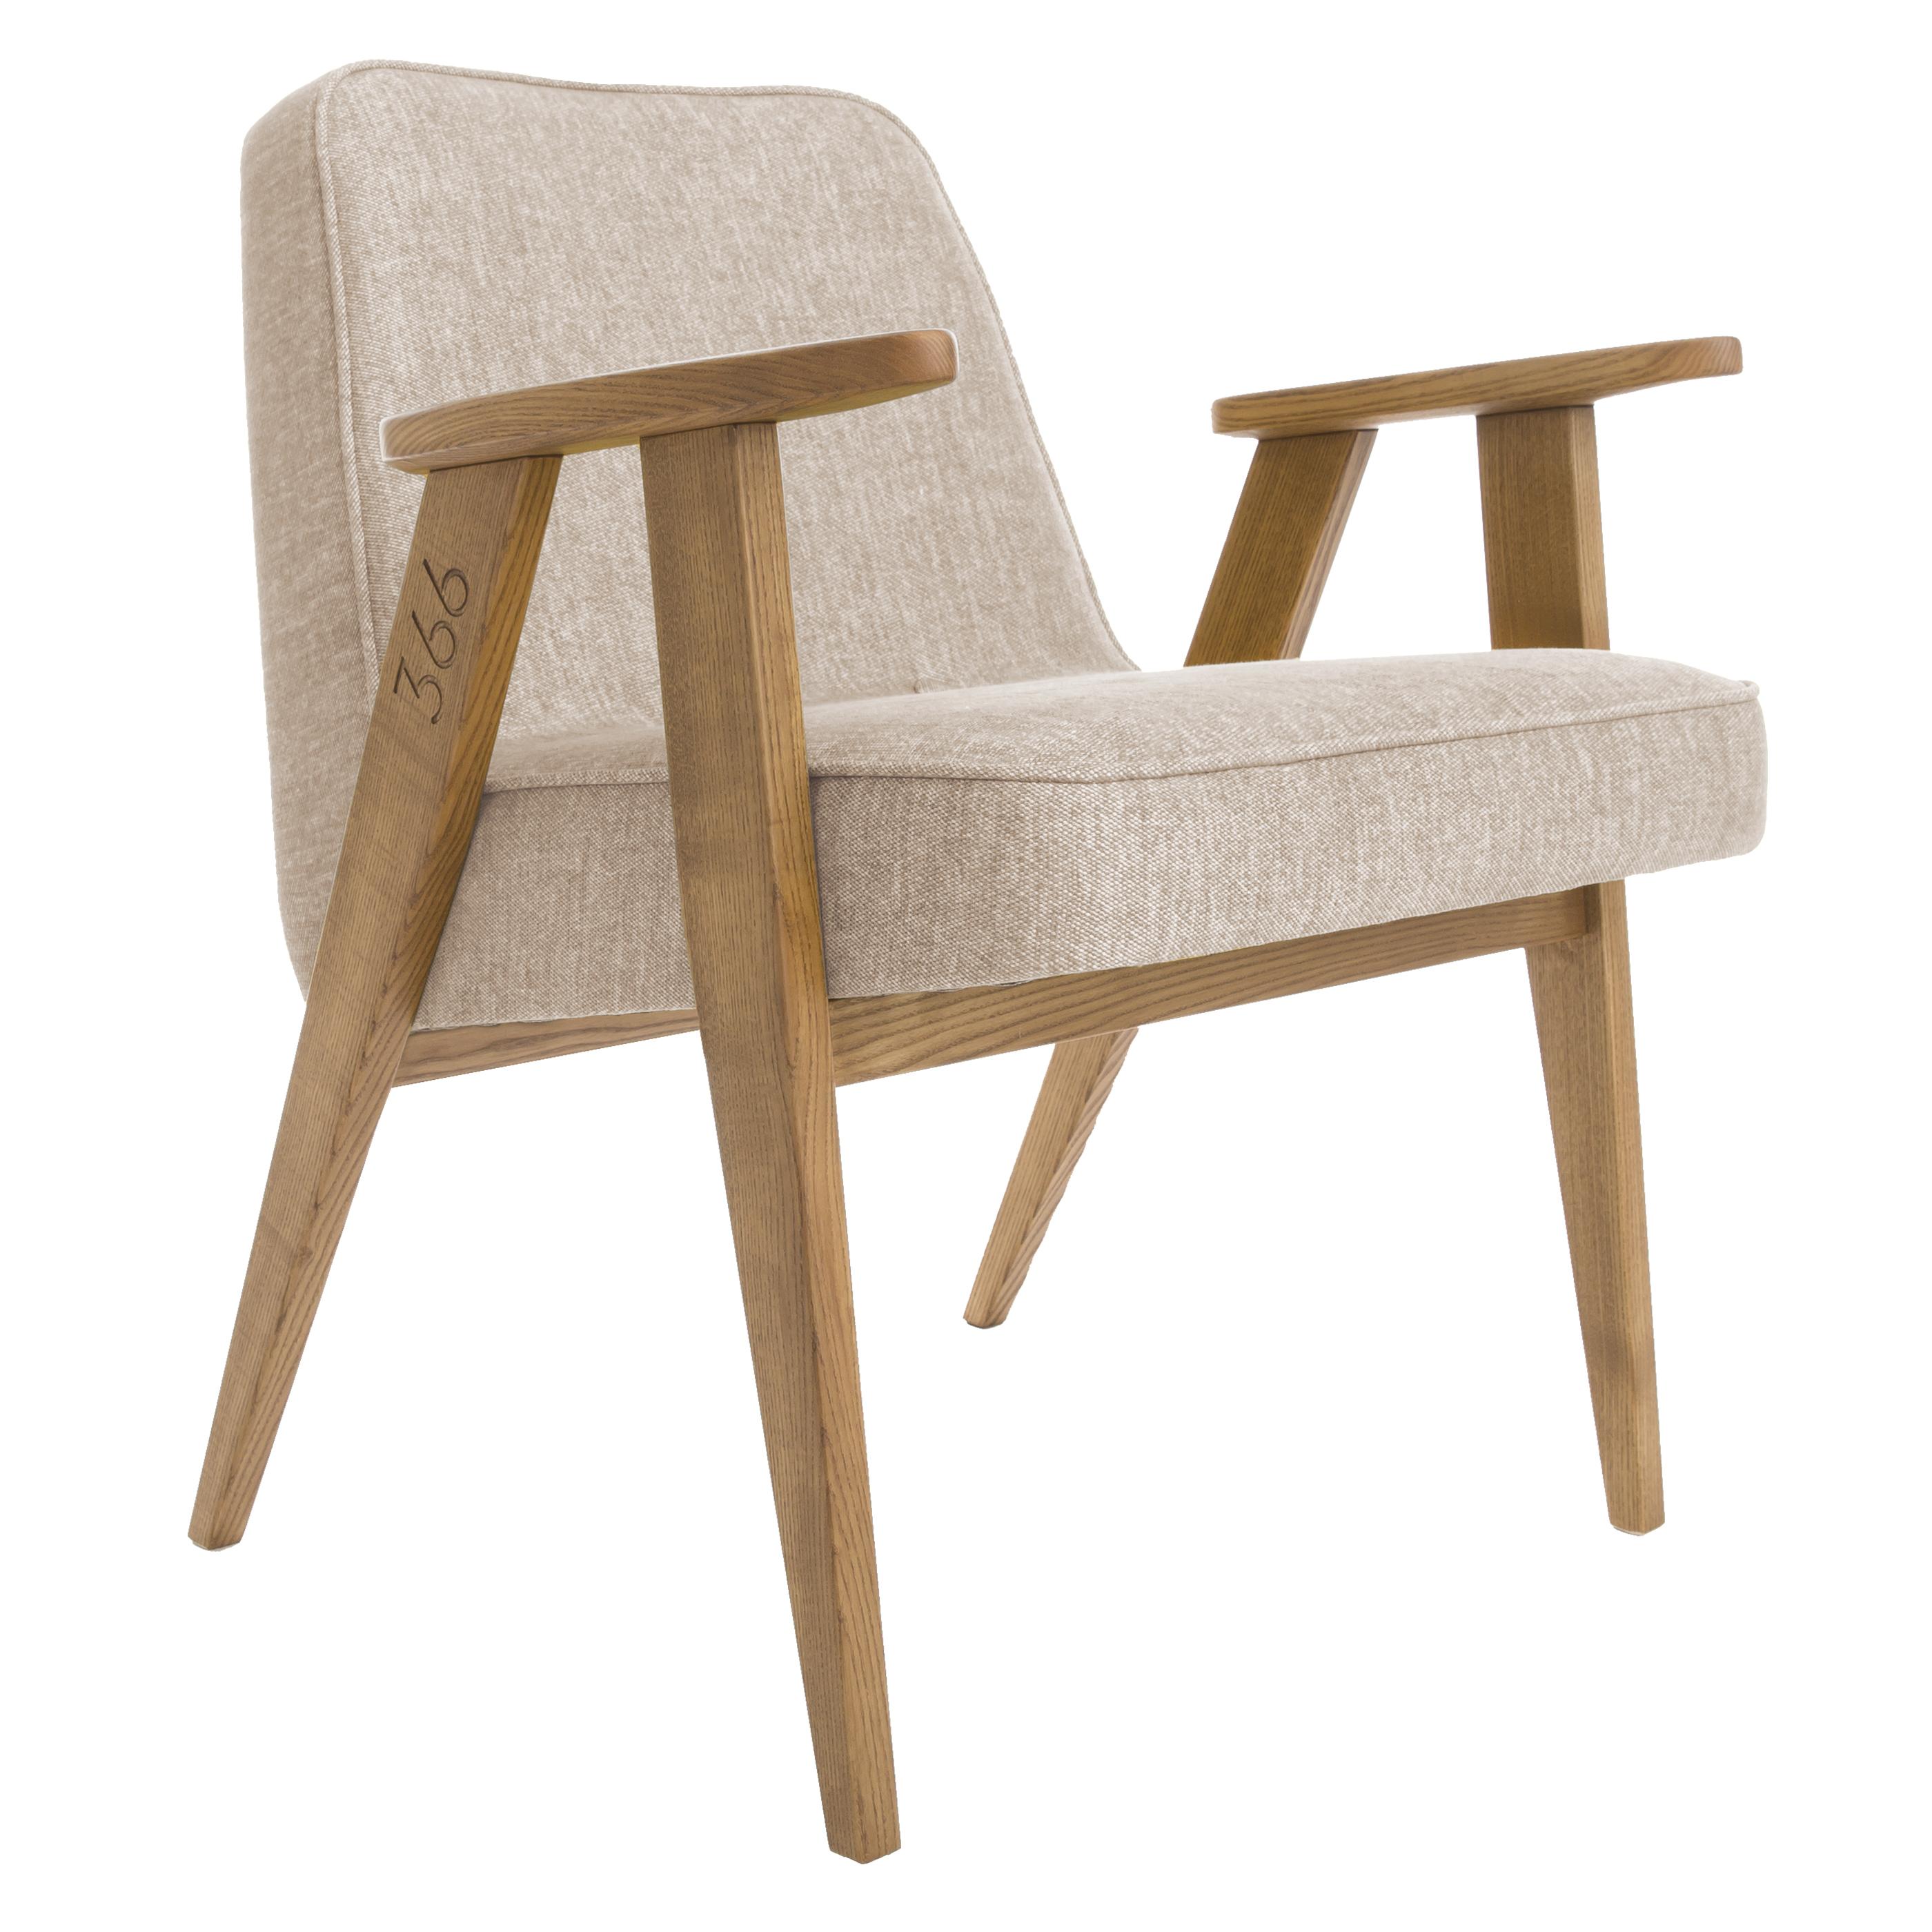 sessel, mobel, wohnen, LOUNGE SESSEL FOX I LOFT - 366 Concept   366 armchair   Loft 02 Sand   Dark Oak